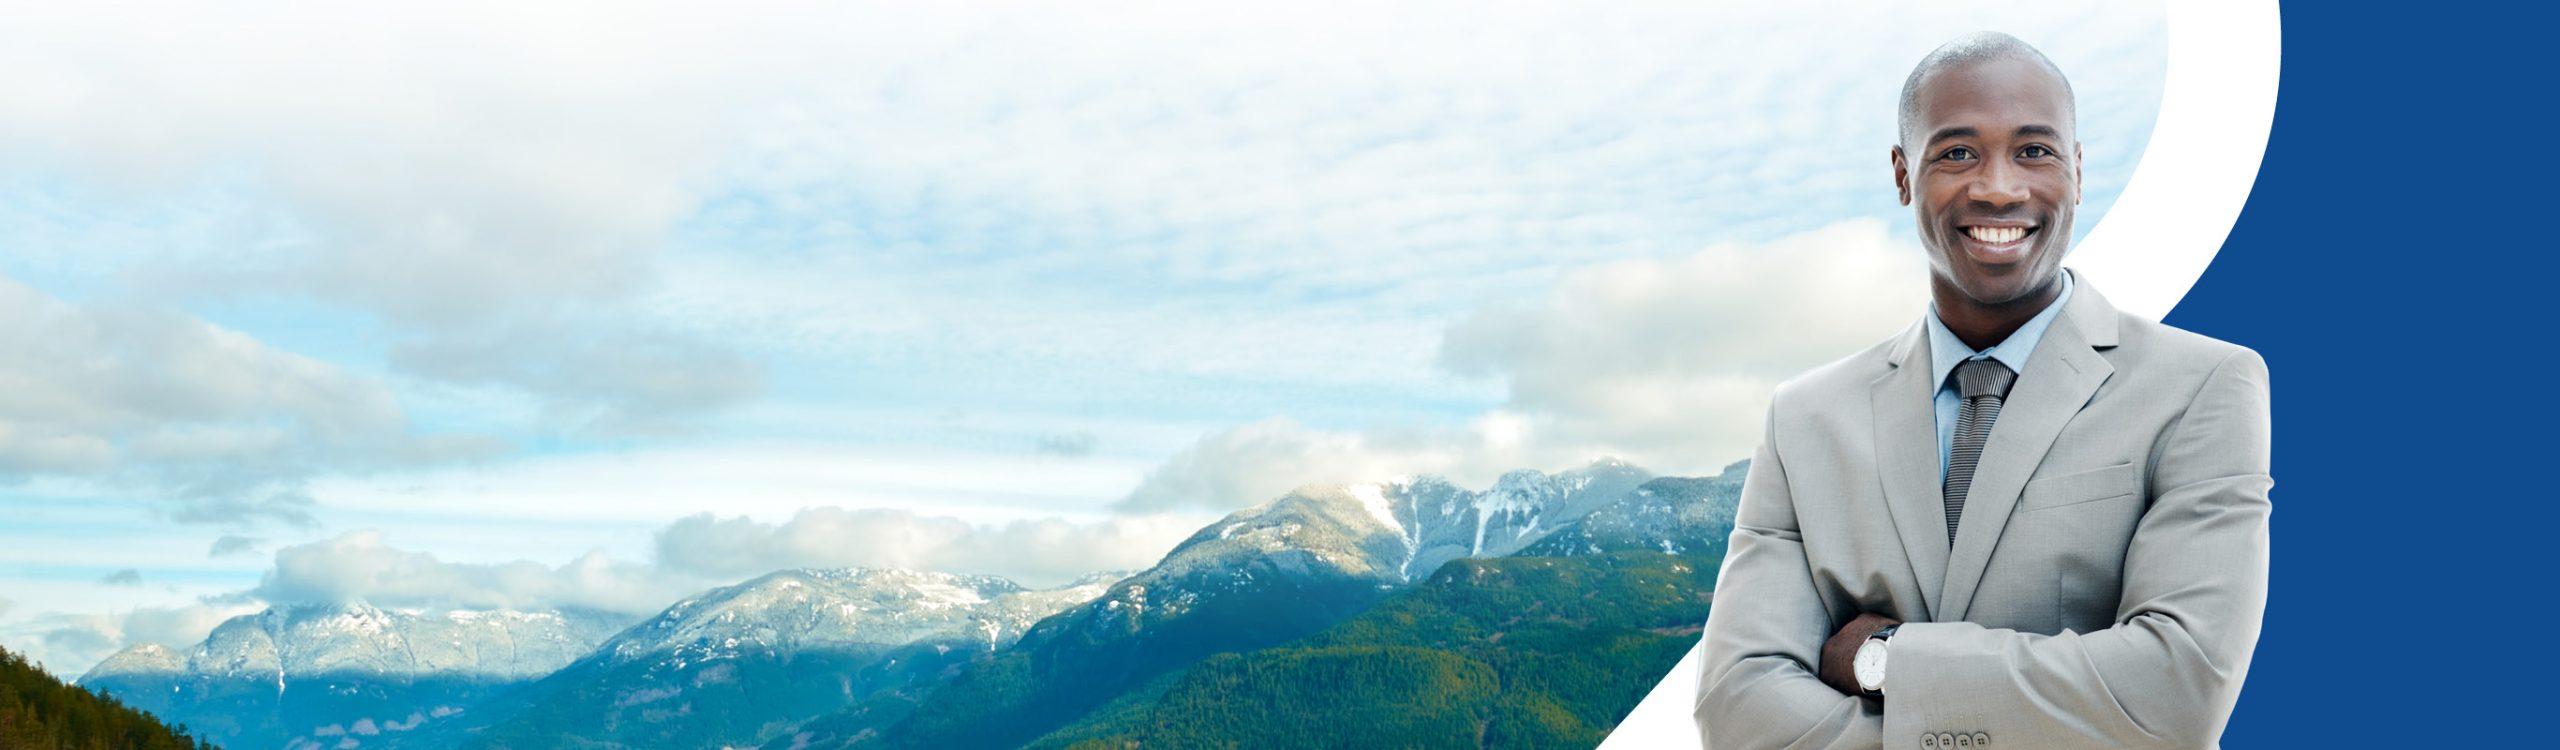 Professional man standing next to British Columbia scenery